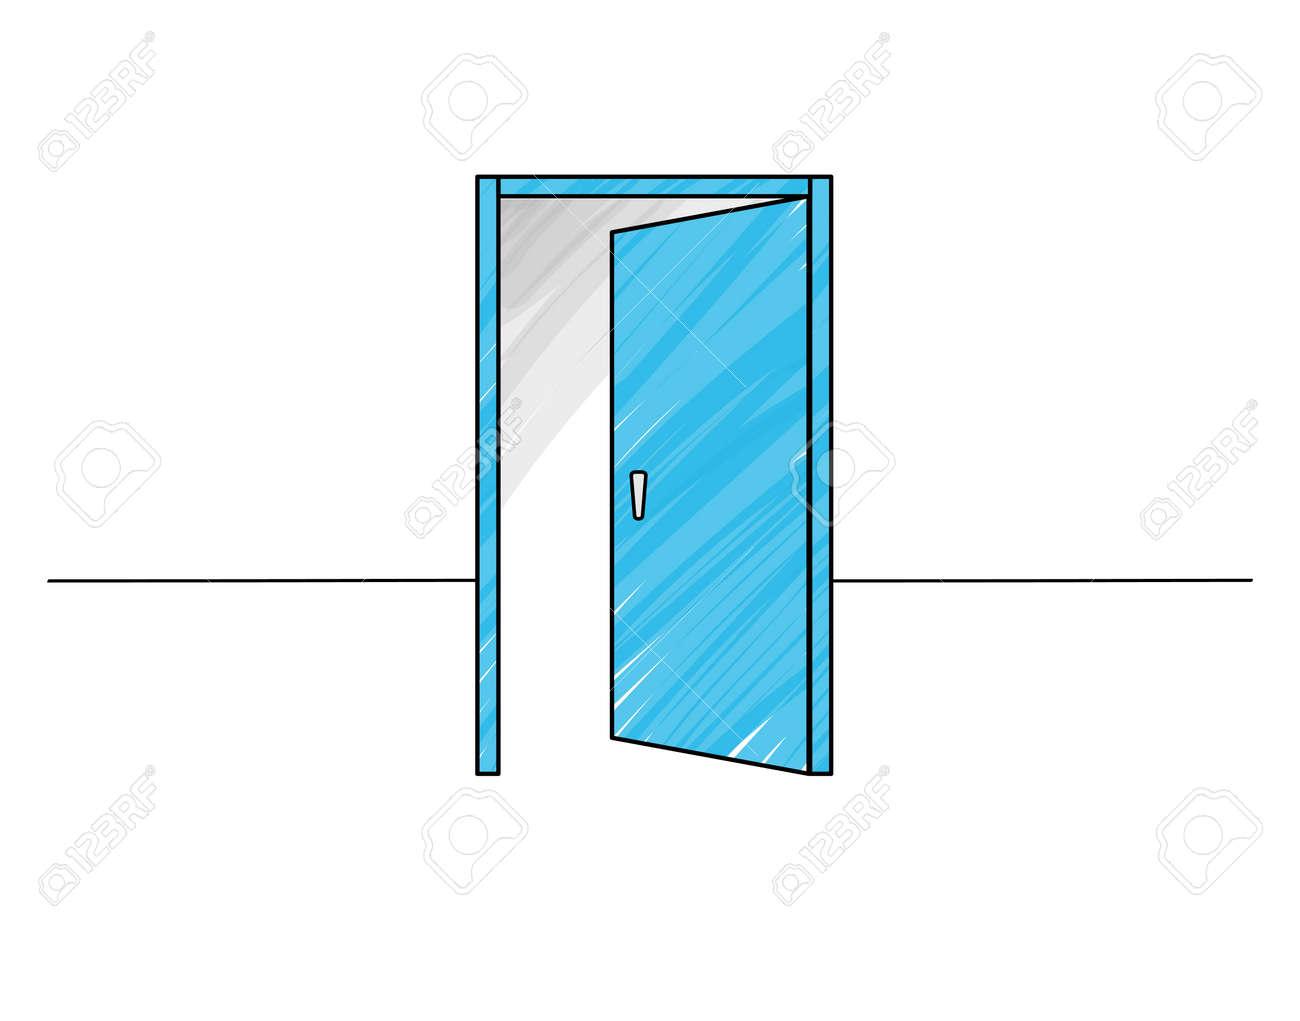 Illustration of an opening door - 168653477